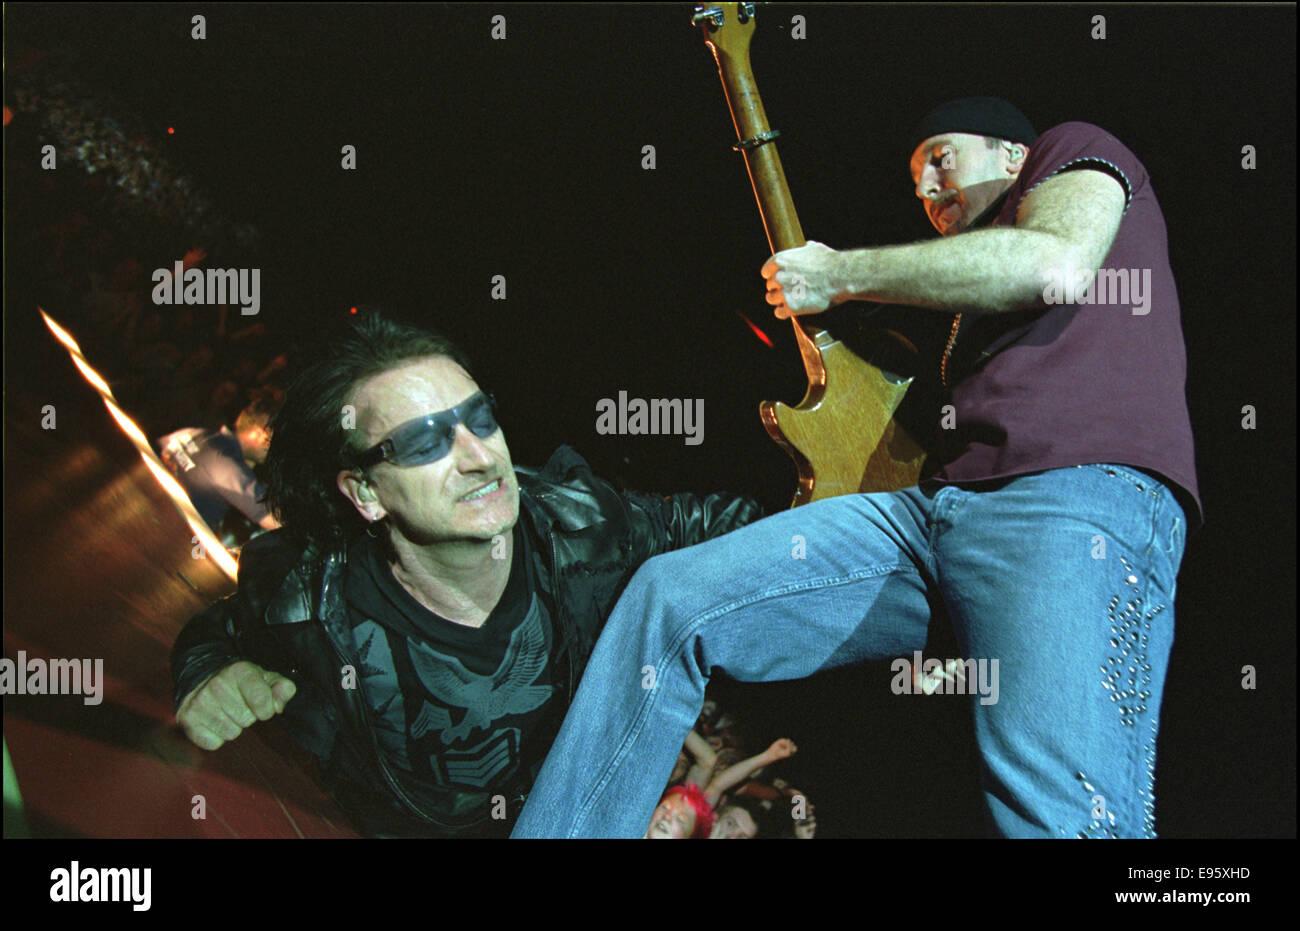 Irish rock band U2 in concert, GLASGOW SECC, Scotland, 28.08.01. - Stock Image